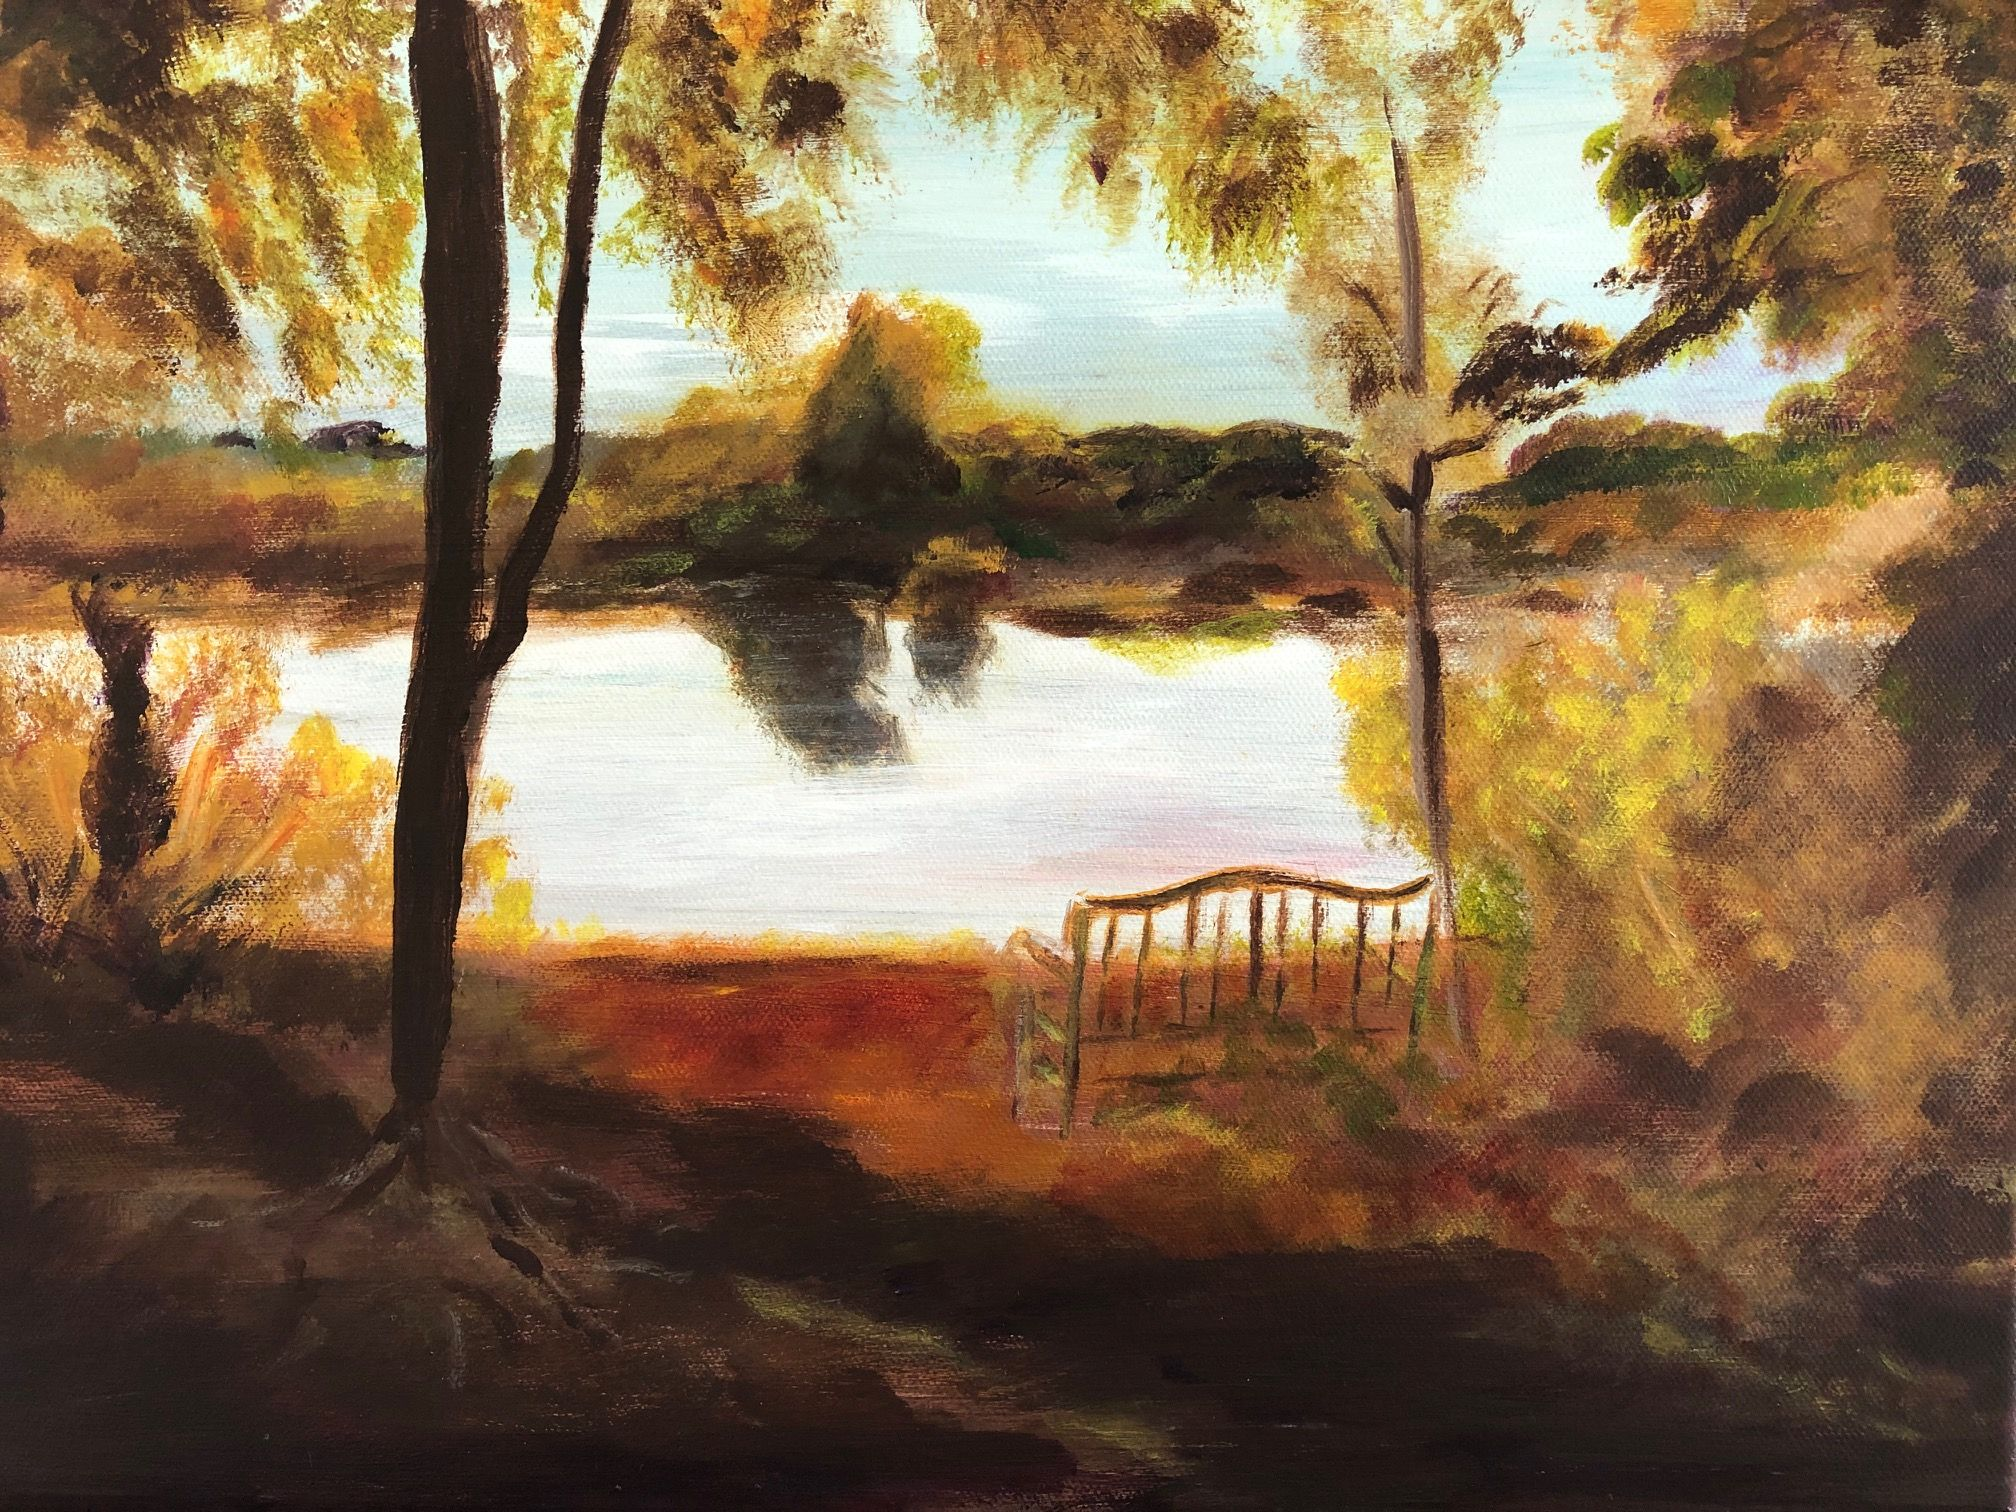 Artist: Ginny Blank, Oil on Canvas